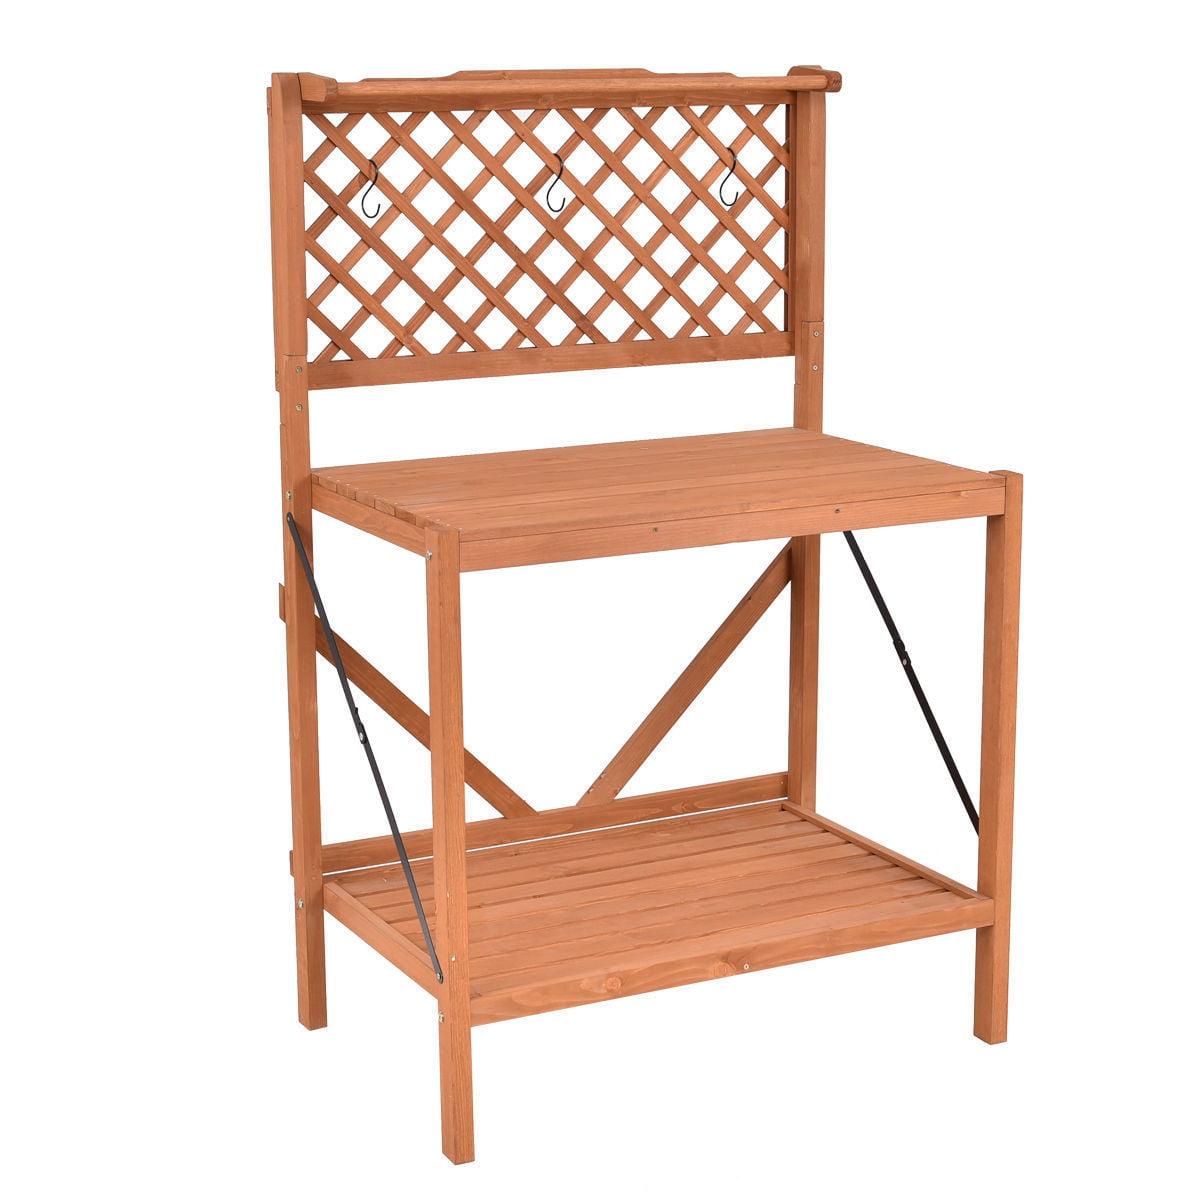 "GHP 35.4""x23.4""x56.3"" Natural Wood Potting Bench with 3 Hooks Handling Bar & Shelf"